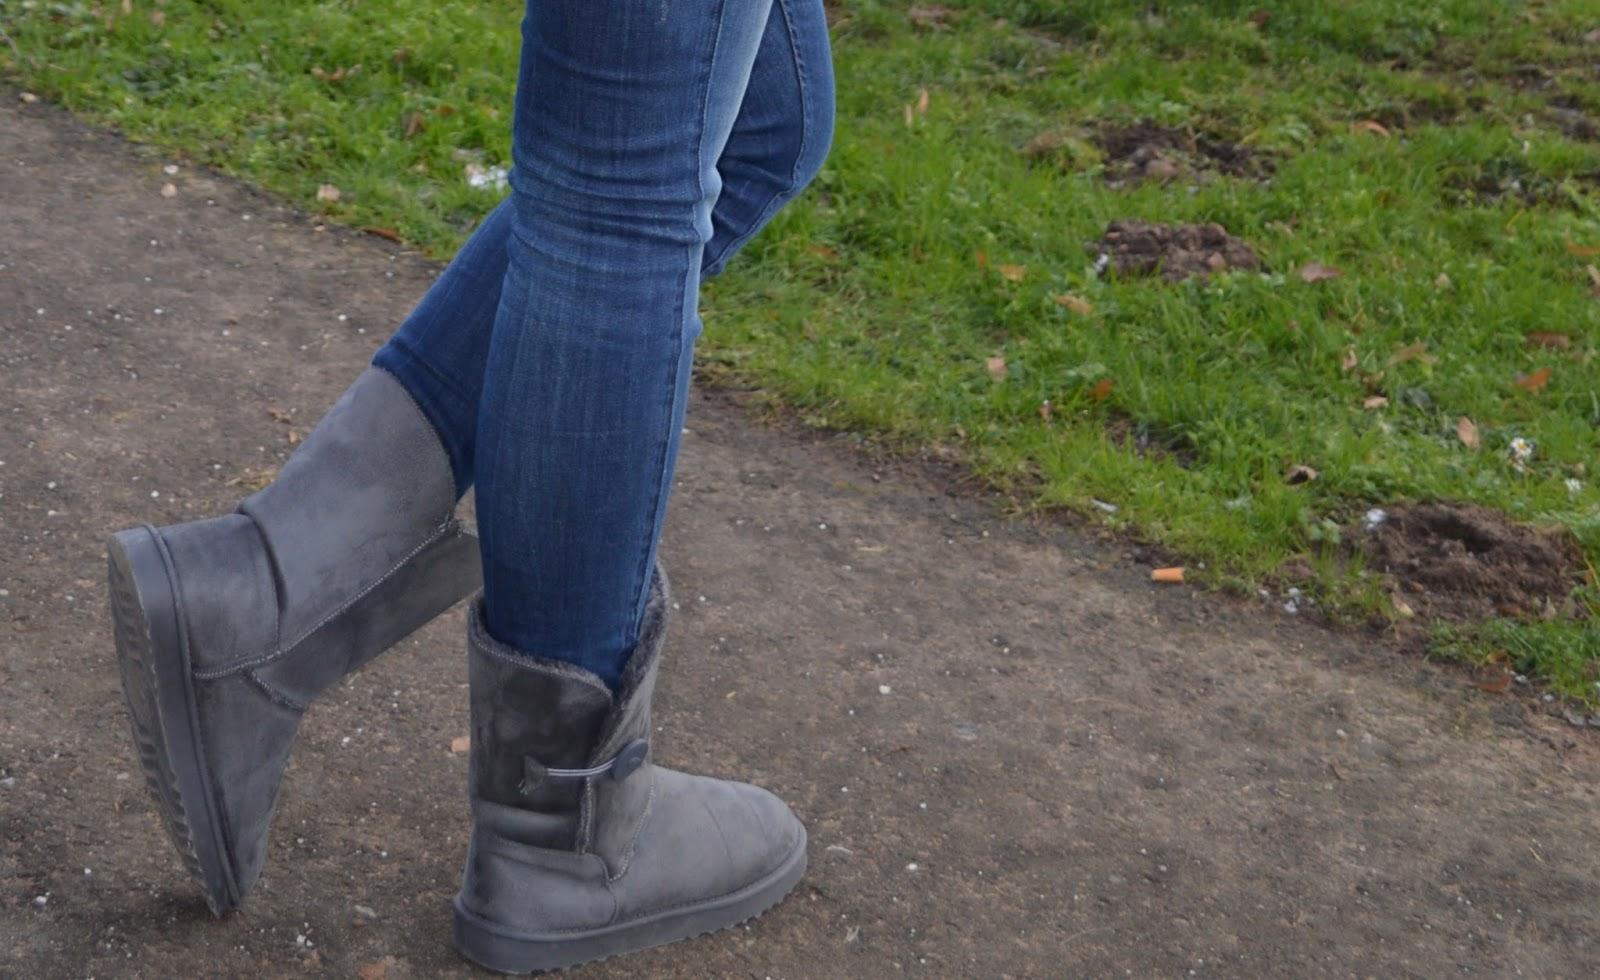 Boots - Grau - Schuhtempel24